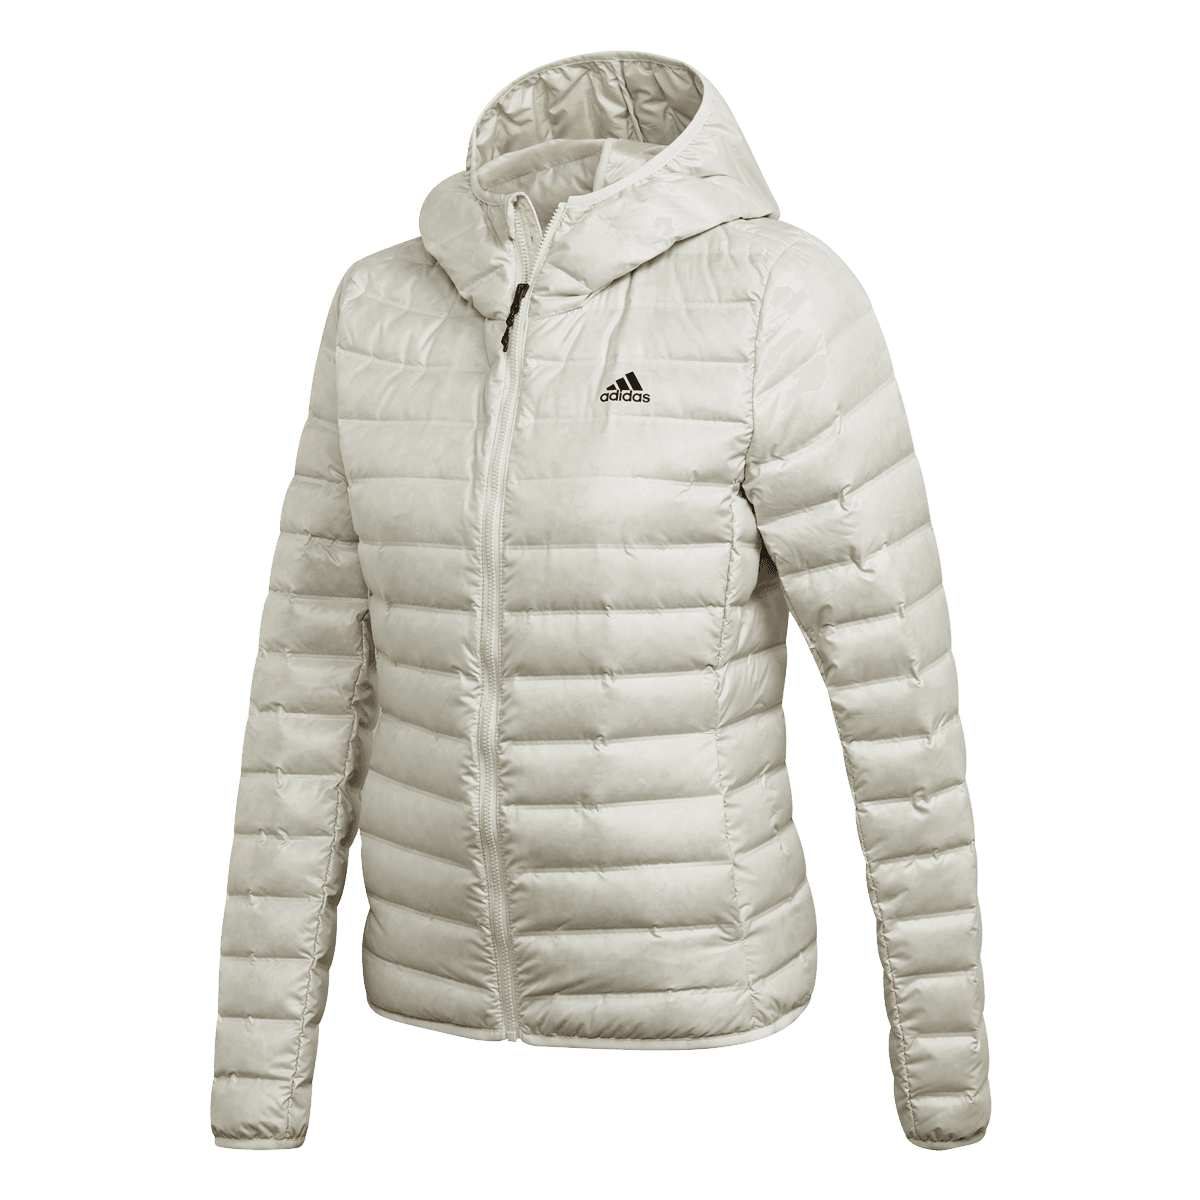 adidas Damen Daunenjacke Varilite Hooded Jacket weiß